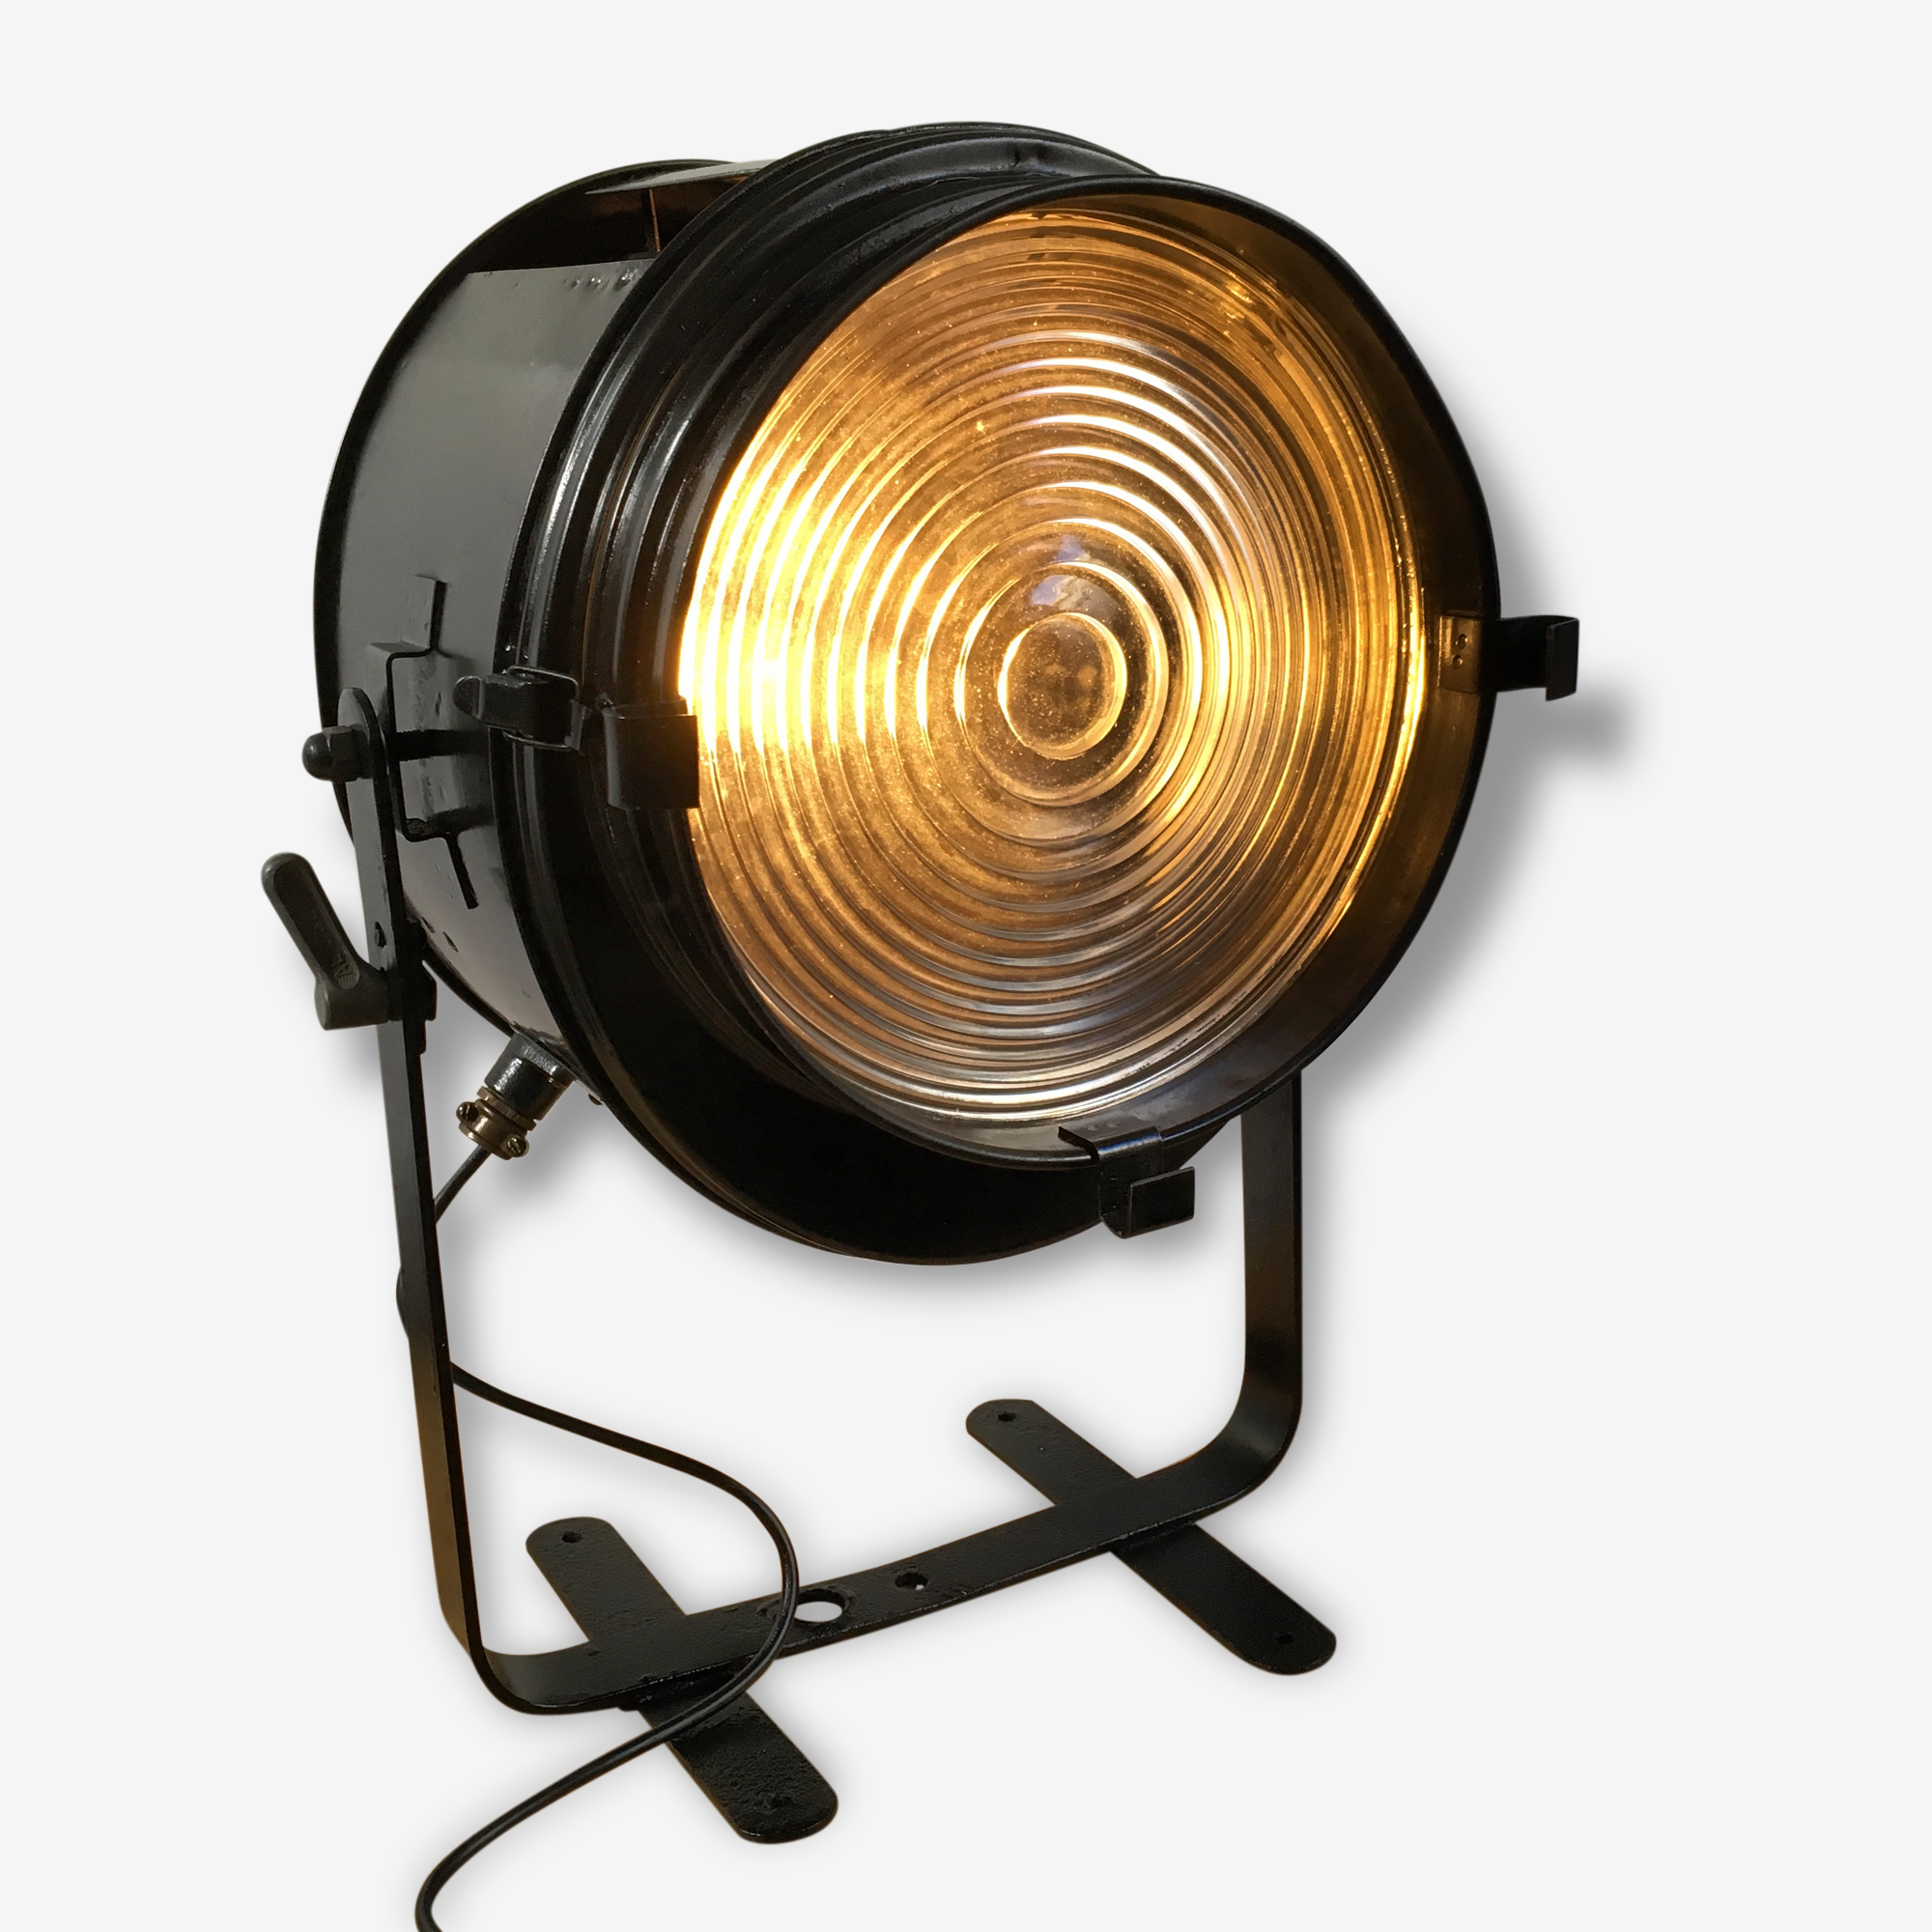 Projecteur Cremer 2kw